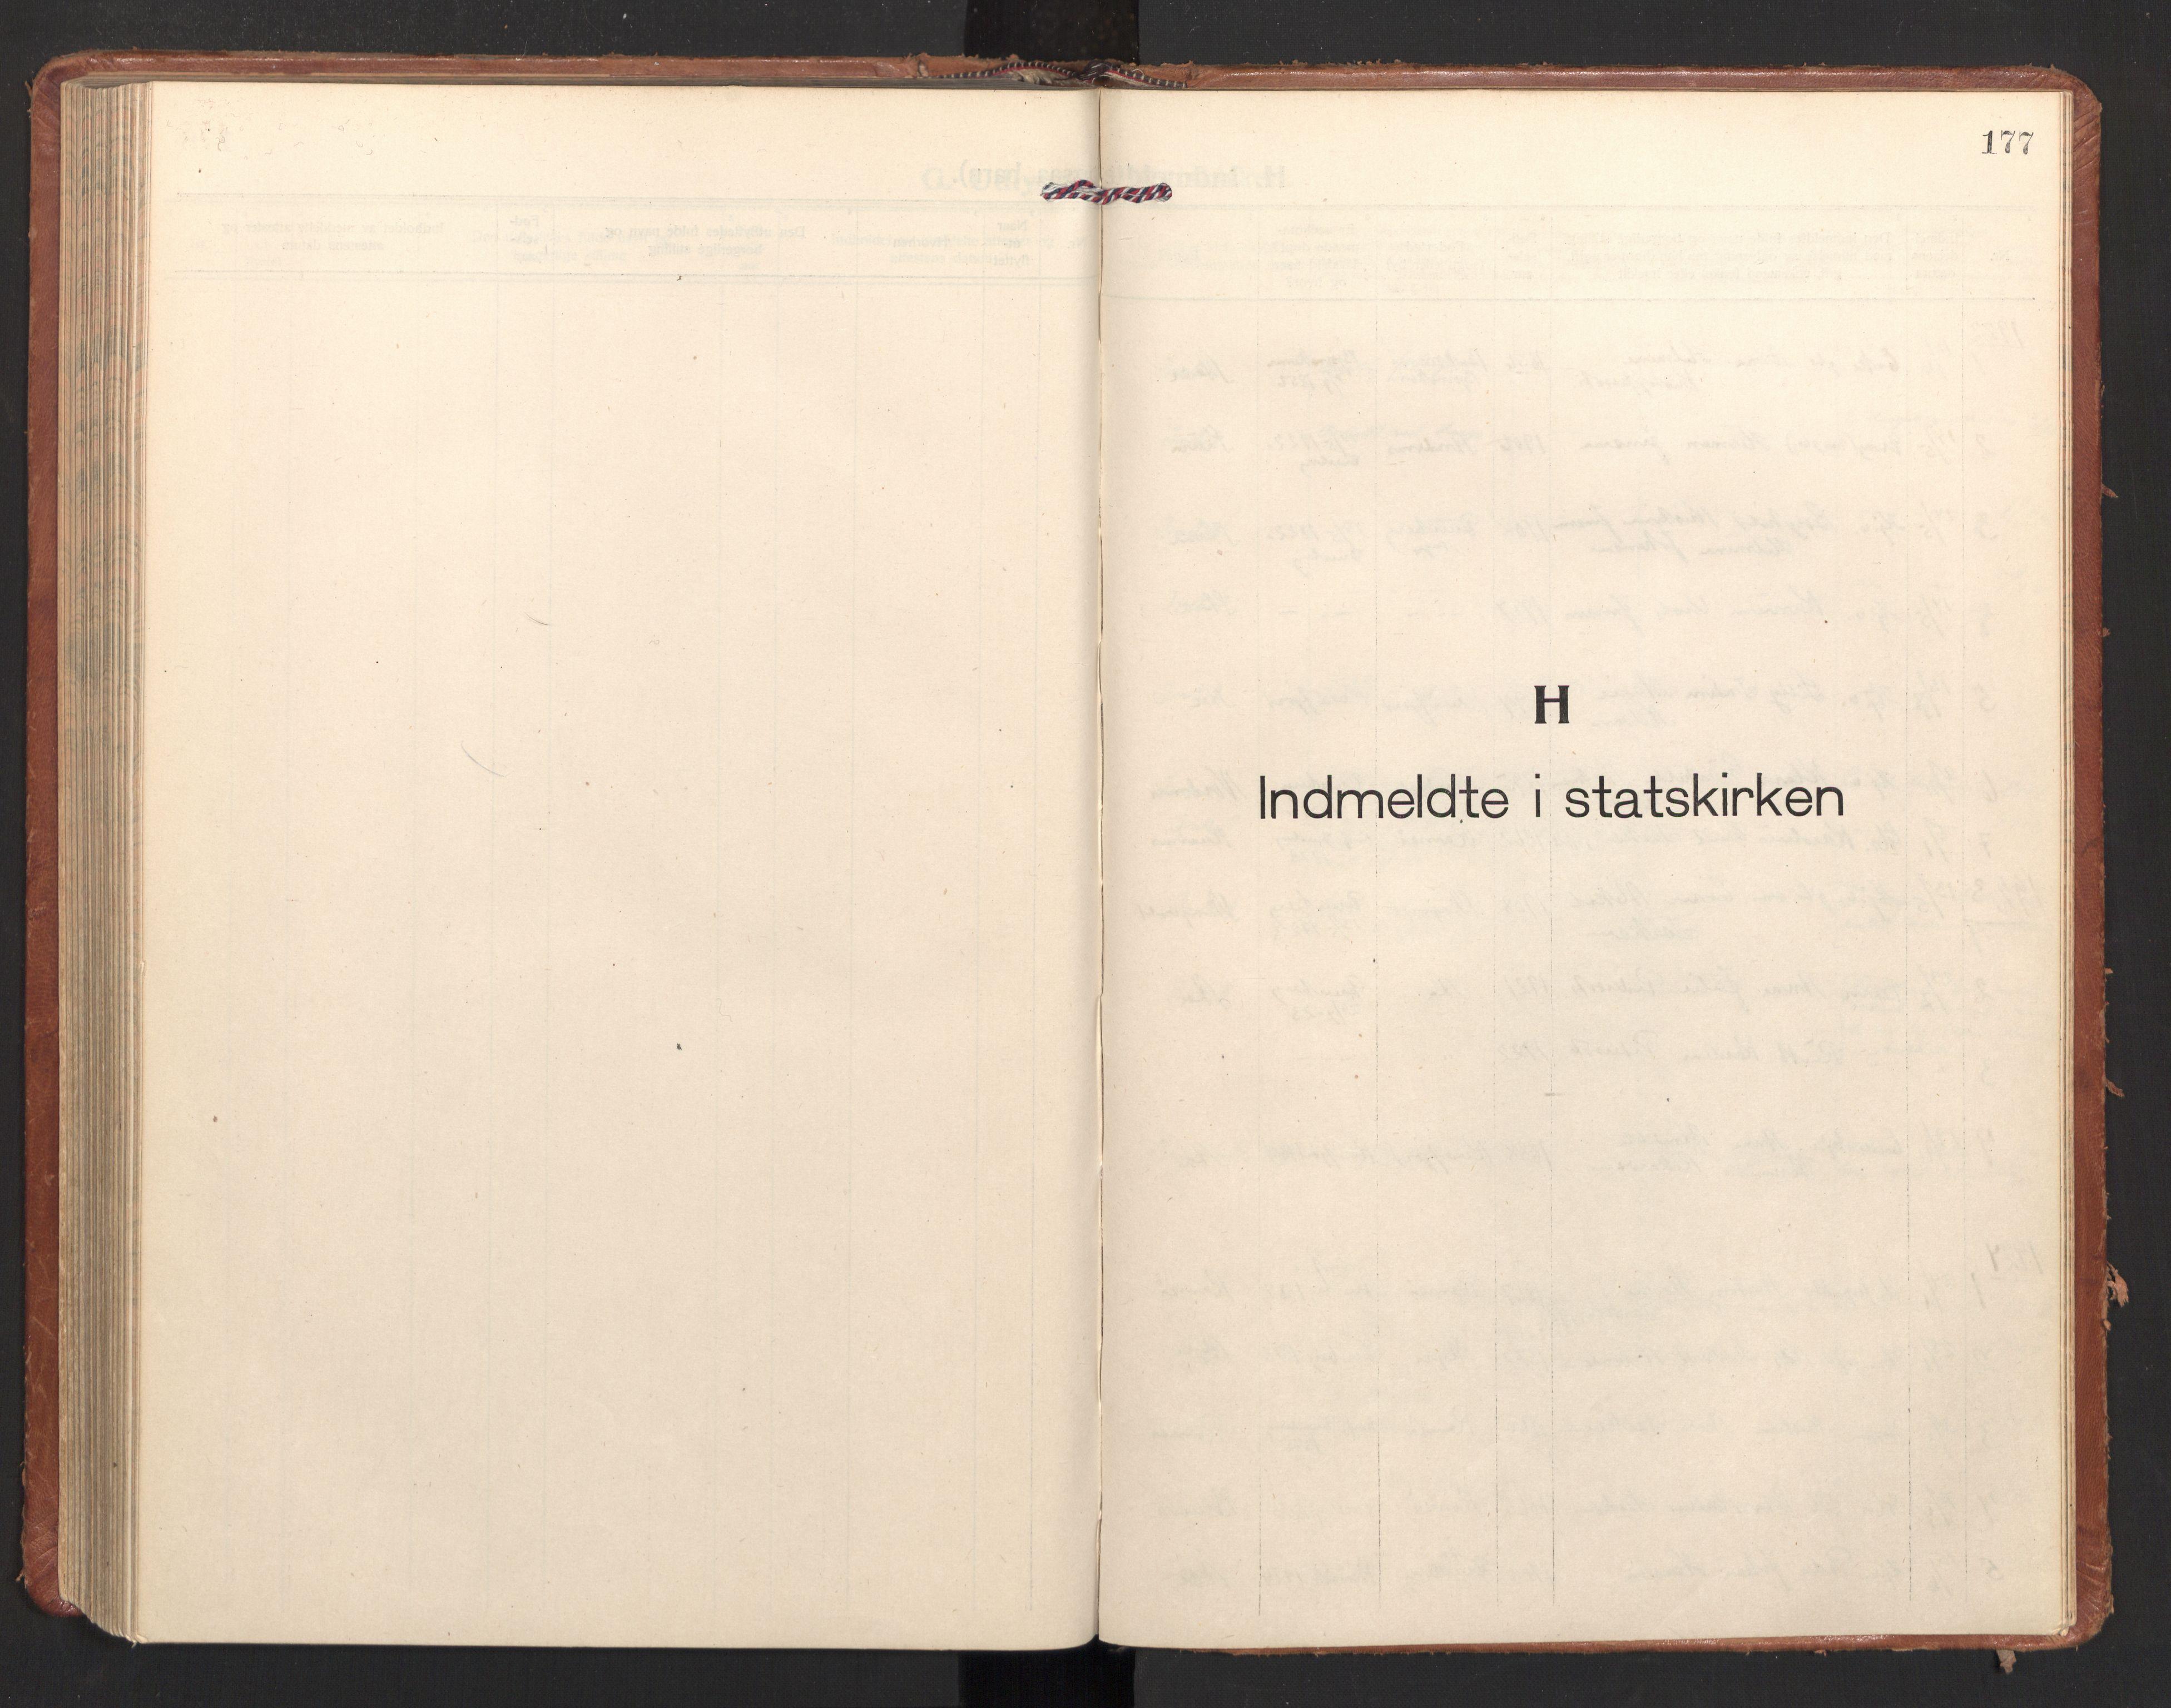 SAT, Ministerialprotokoller, klokkerbøker og fødselsregistre - Nordland, 897/L1408: Ministerialbok nr. 897A15, 1922-1938, s. 177